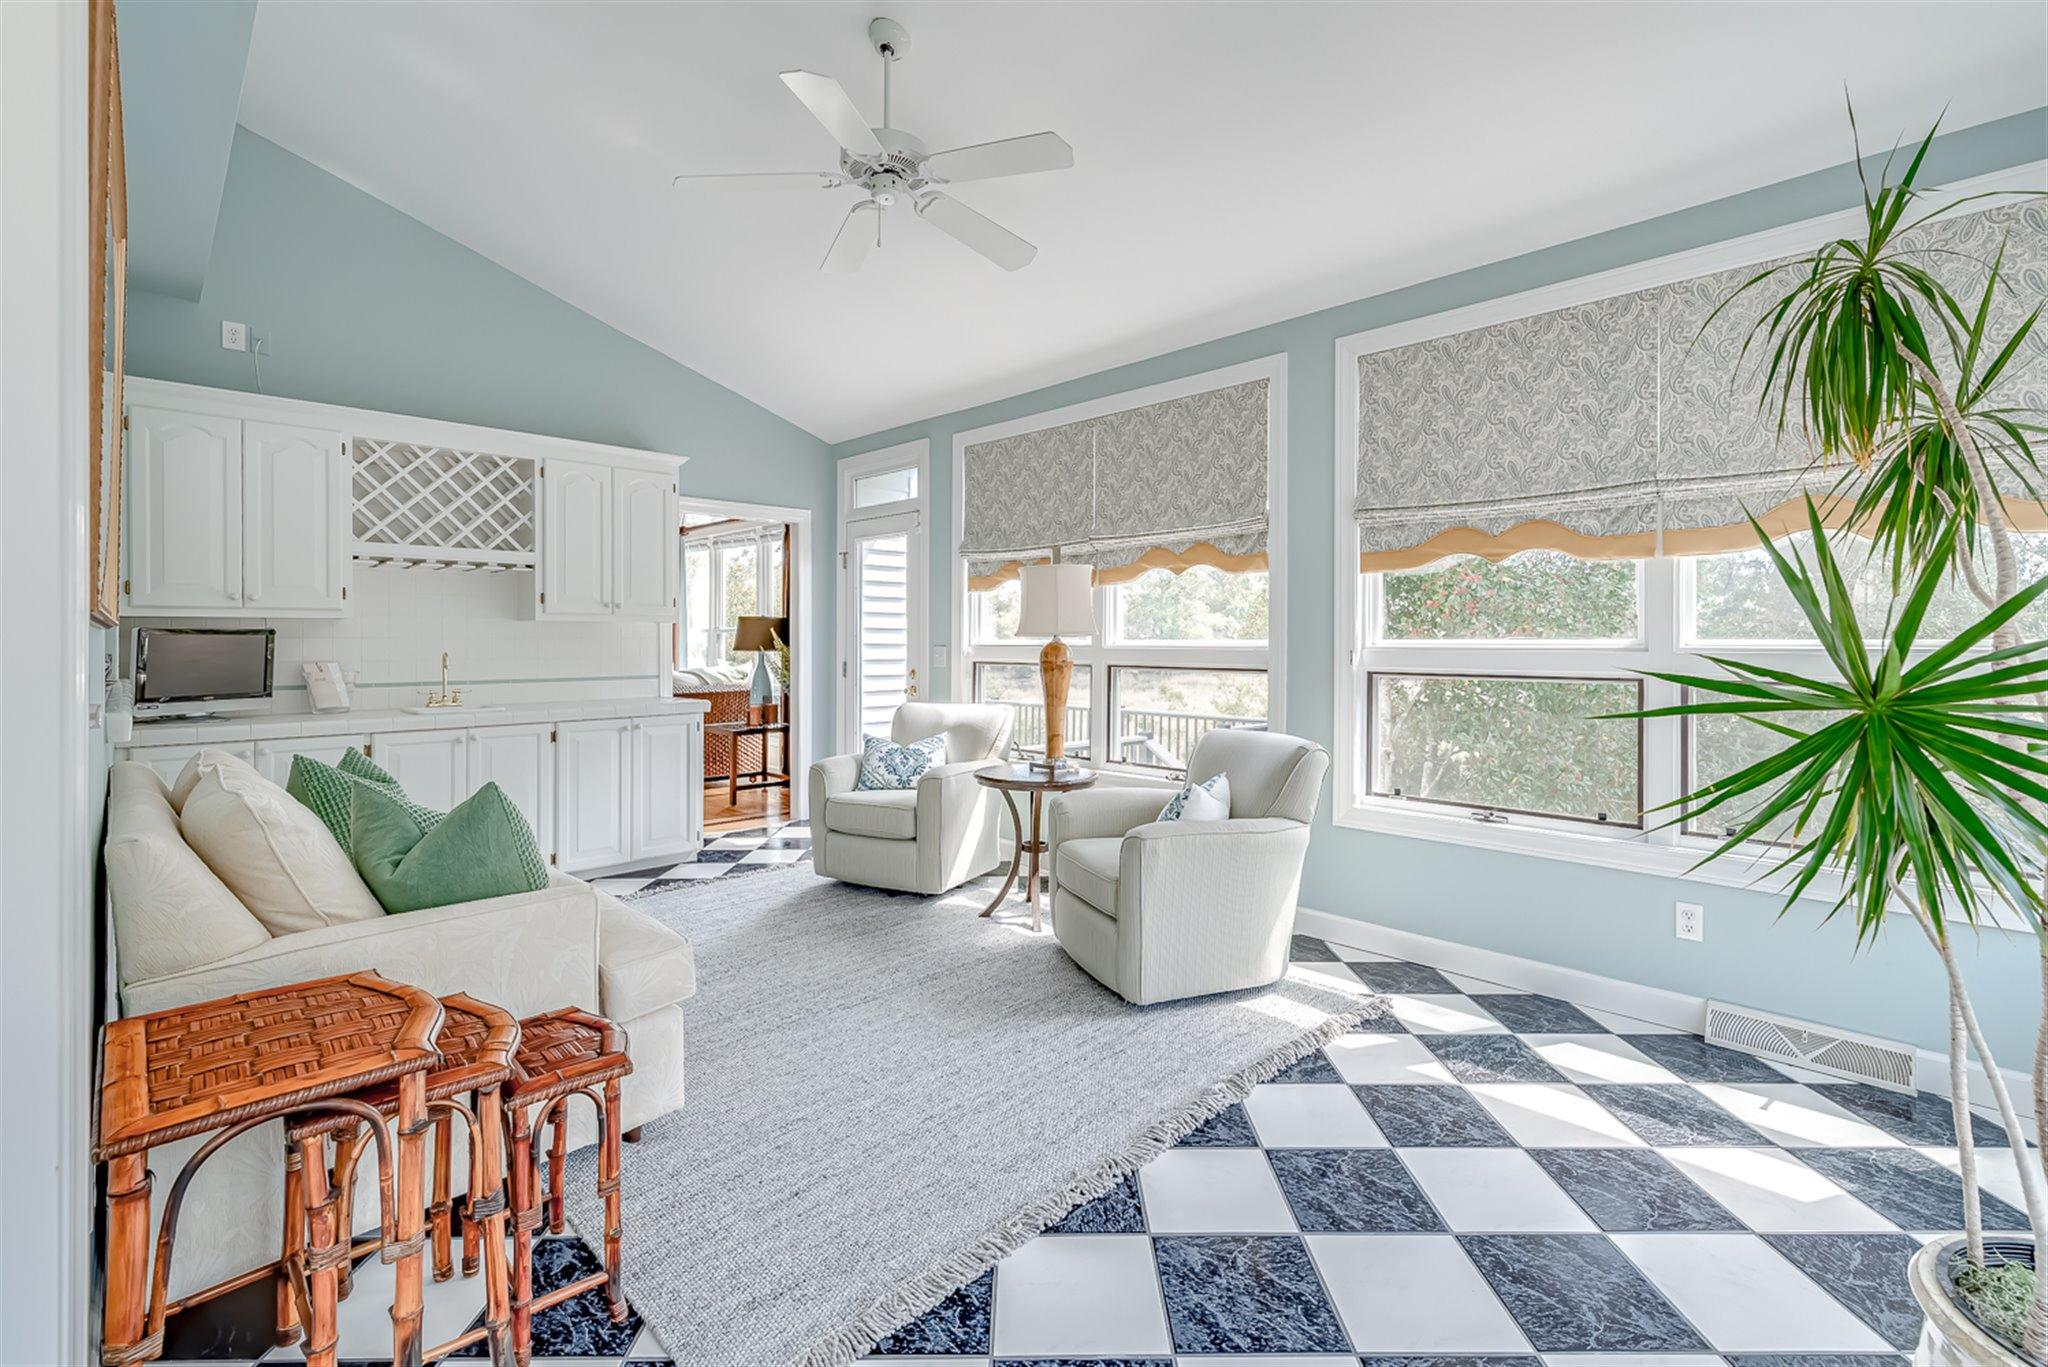 Indigo Point Homes For Sale - 50 Indigo Point, Charleston, SC - 22